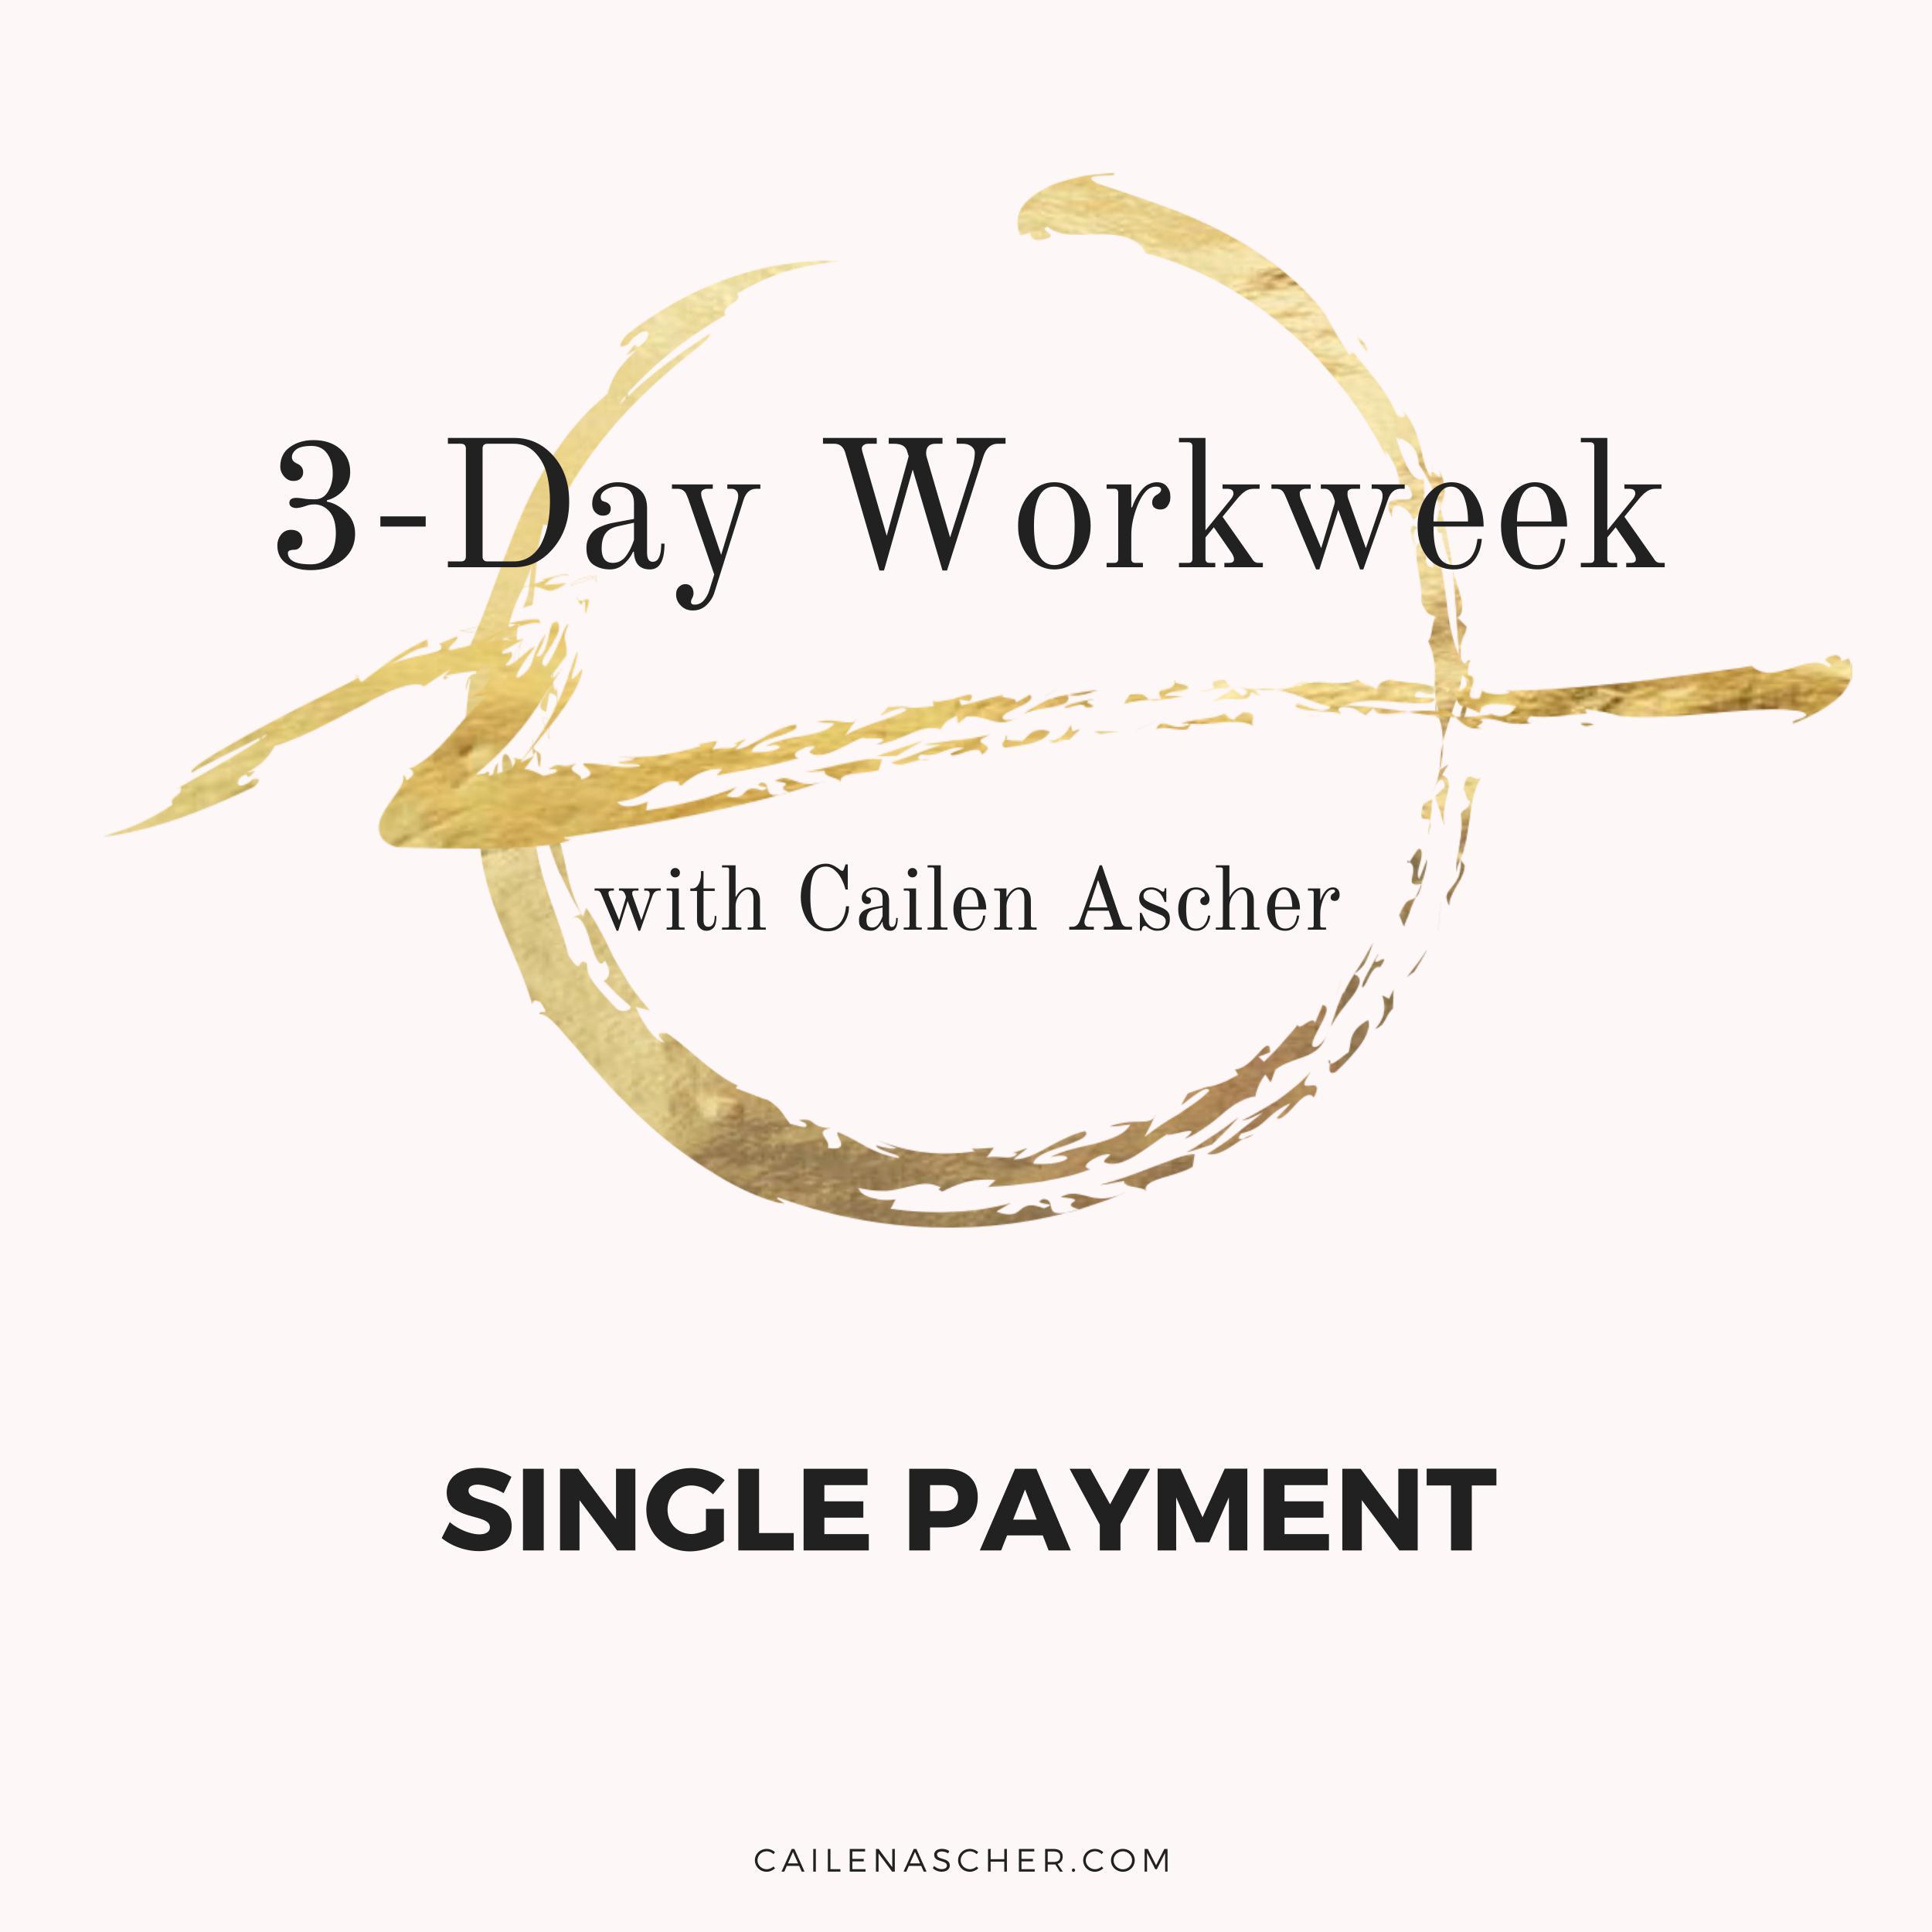 Cailen Ascher - 3-Day Workweek Program - Payment Plan Option Image - LIVE Track Single Payment.jpg